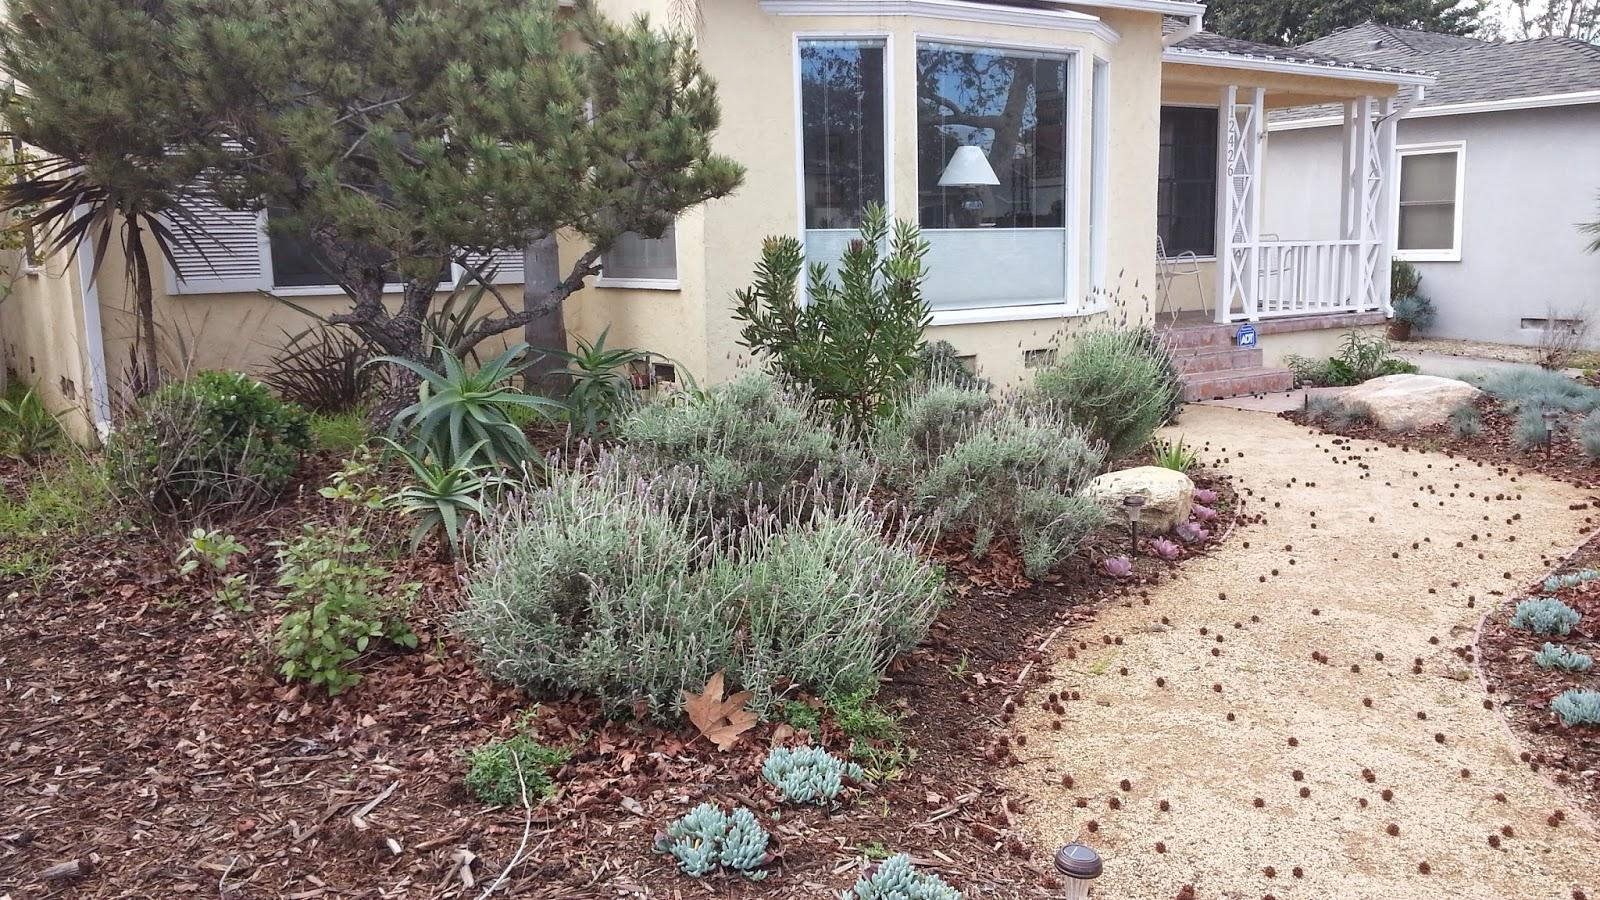 mar vista green garden showcase 12426 stanwood place cluster 3n